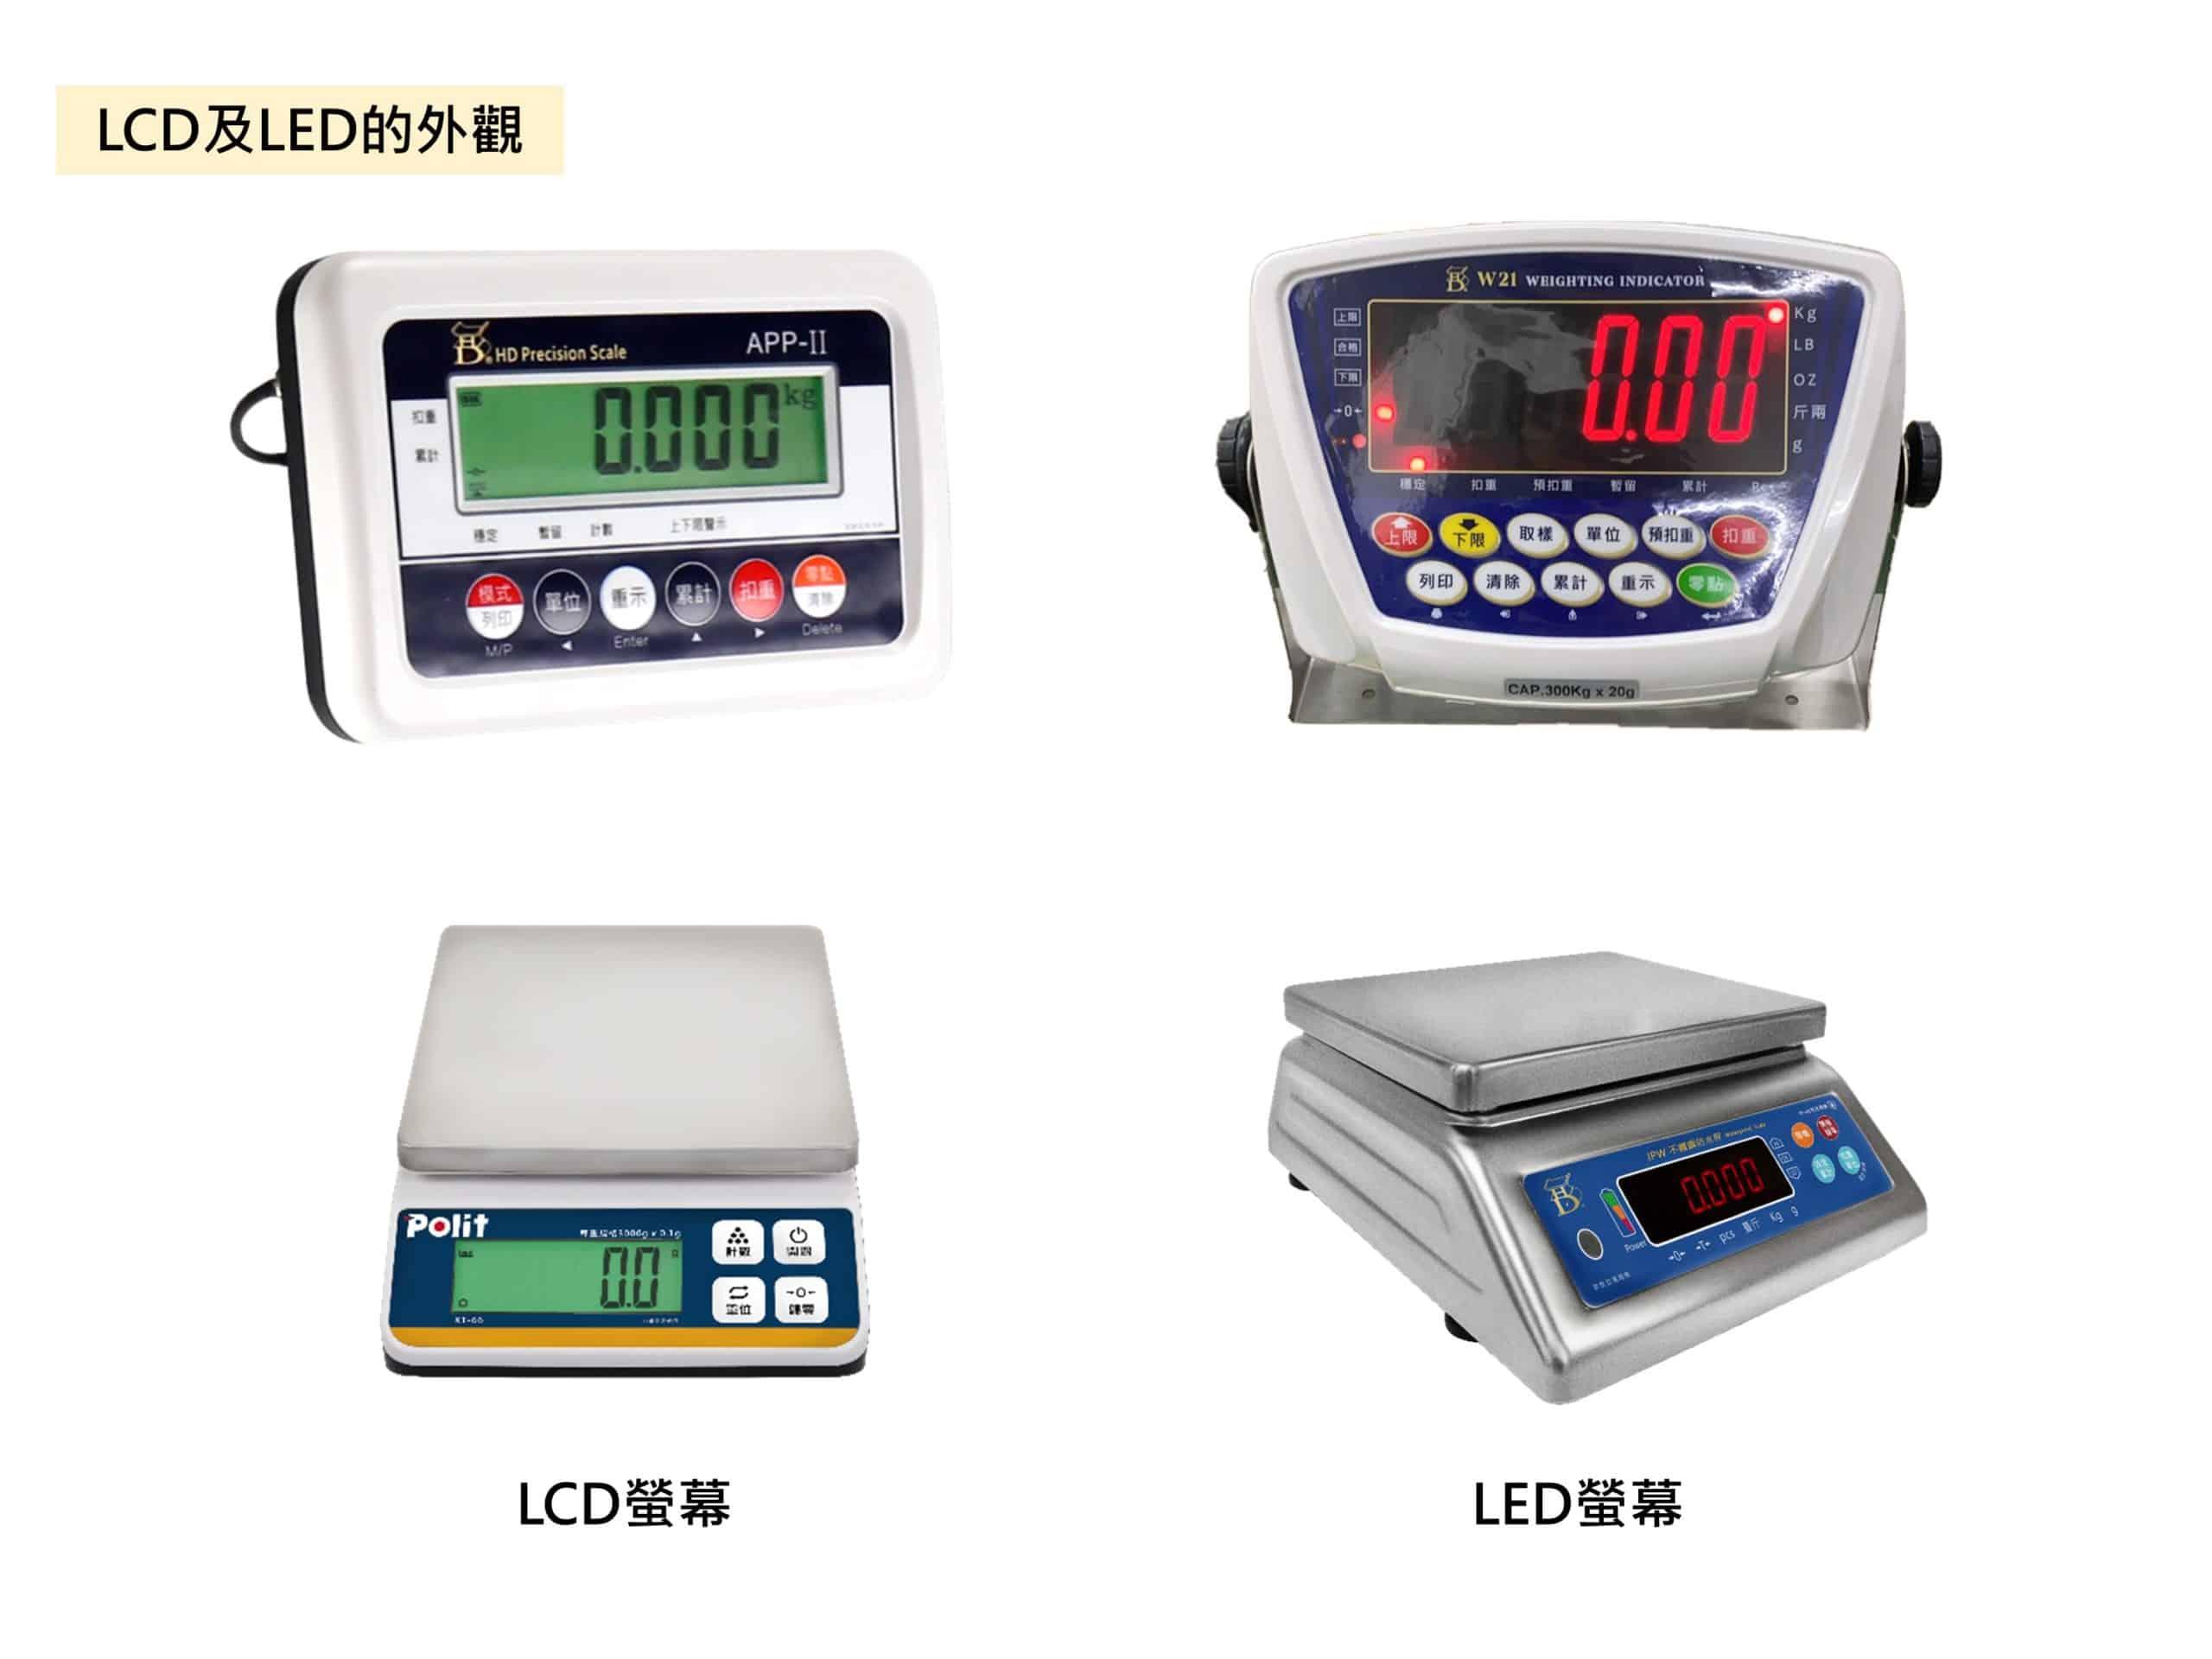 LCD螢幕和LED螢幕的差別 | 沛禮國際 Polit 電子秤專賣